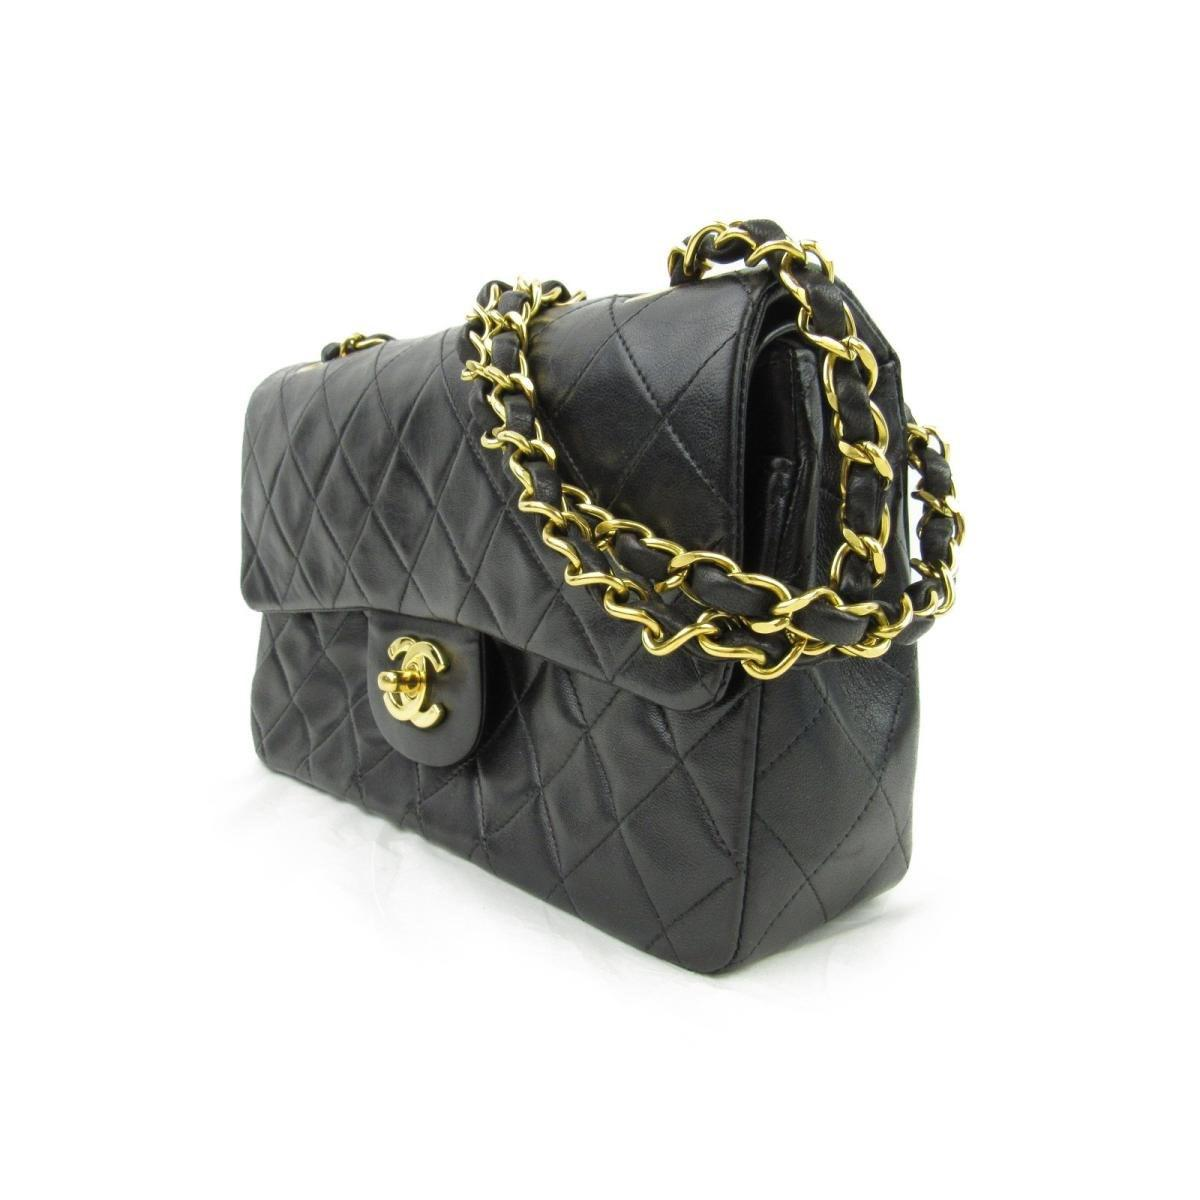 7f4e50541b06c3 Lyst - Chanel Authentic Lambskin Matelasse W Flap Chain Shoulder Bag ...